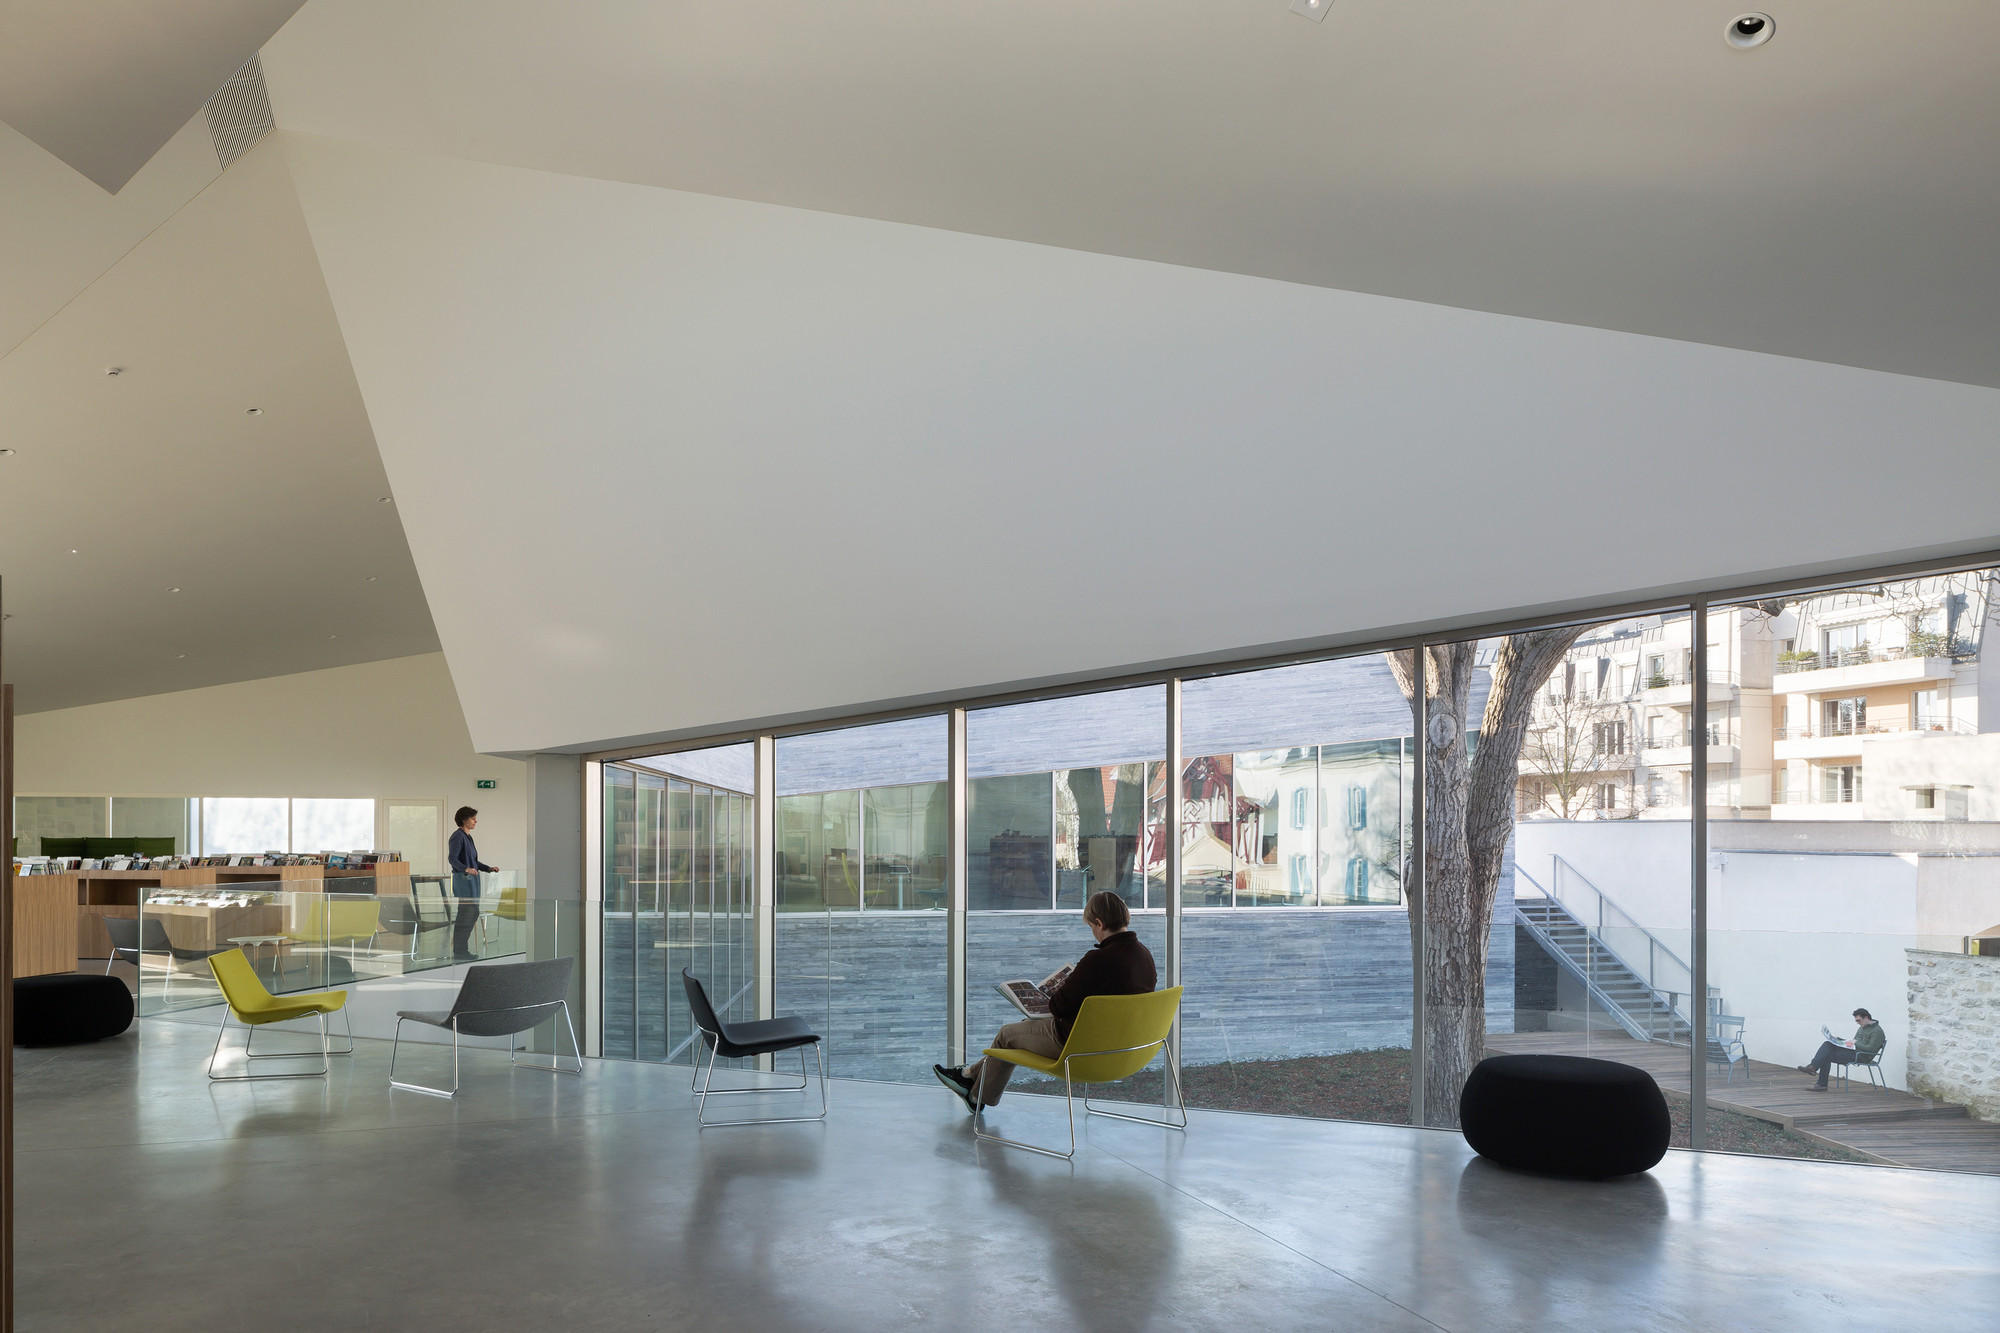 galer a de mediateca en bourg la reine pascale gu dot architecte 12. Black Bedroom Furniture Sets. Home Design Ideas